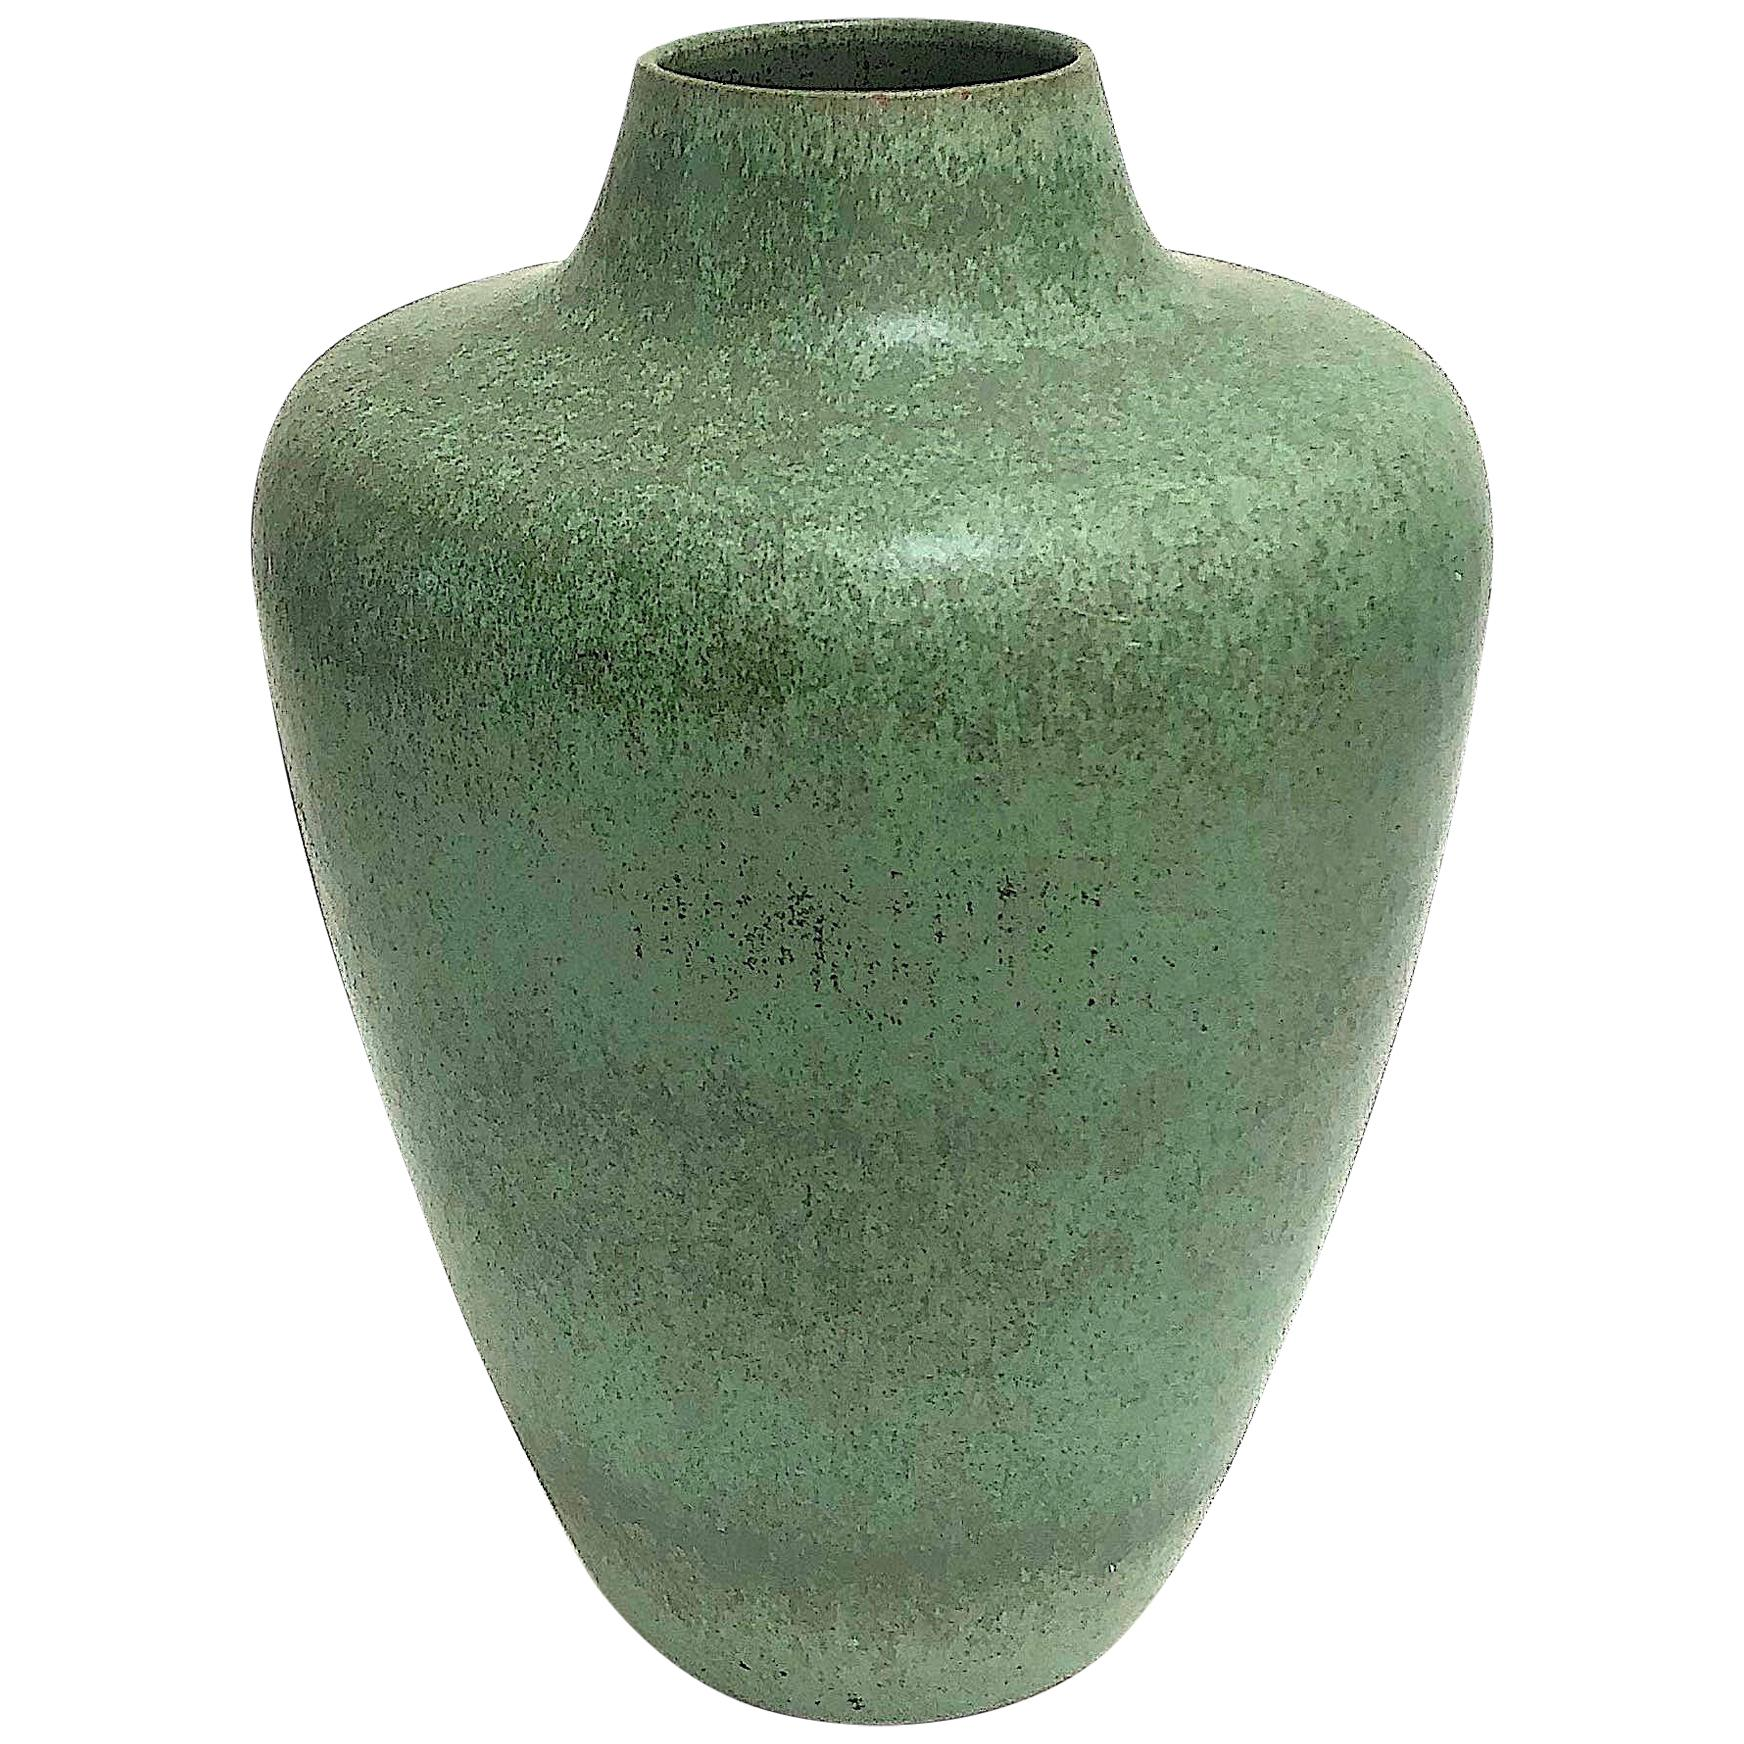 Monumental Hameln Stoneware Floor Vase, Bauhaus, Delius